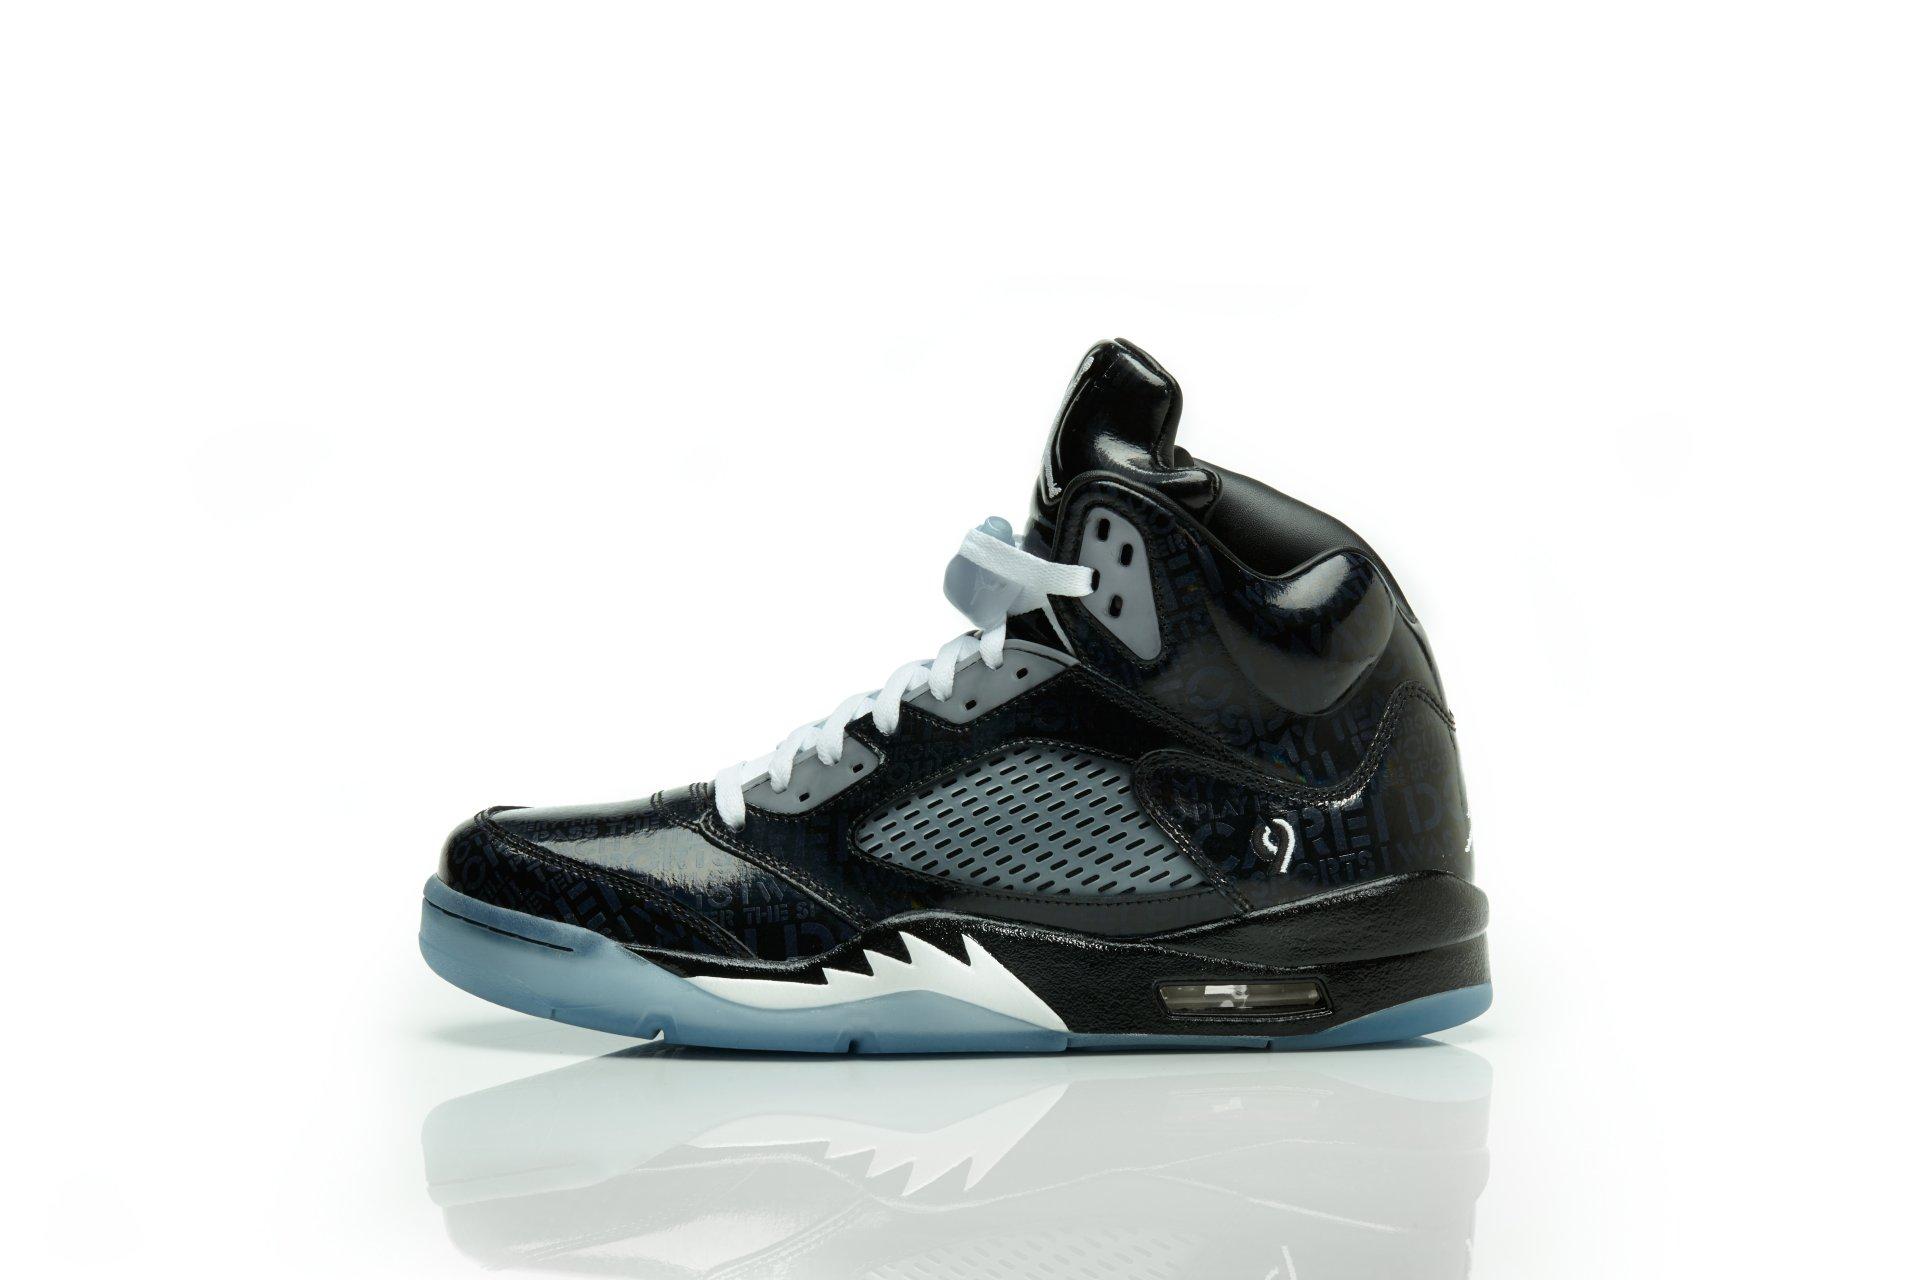 fe15c2b3cca 2017 Nike Air Jordan 6 Gs Pink White Shoes Super Deals   CTT